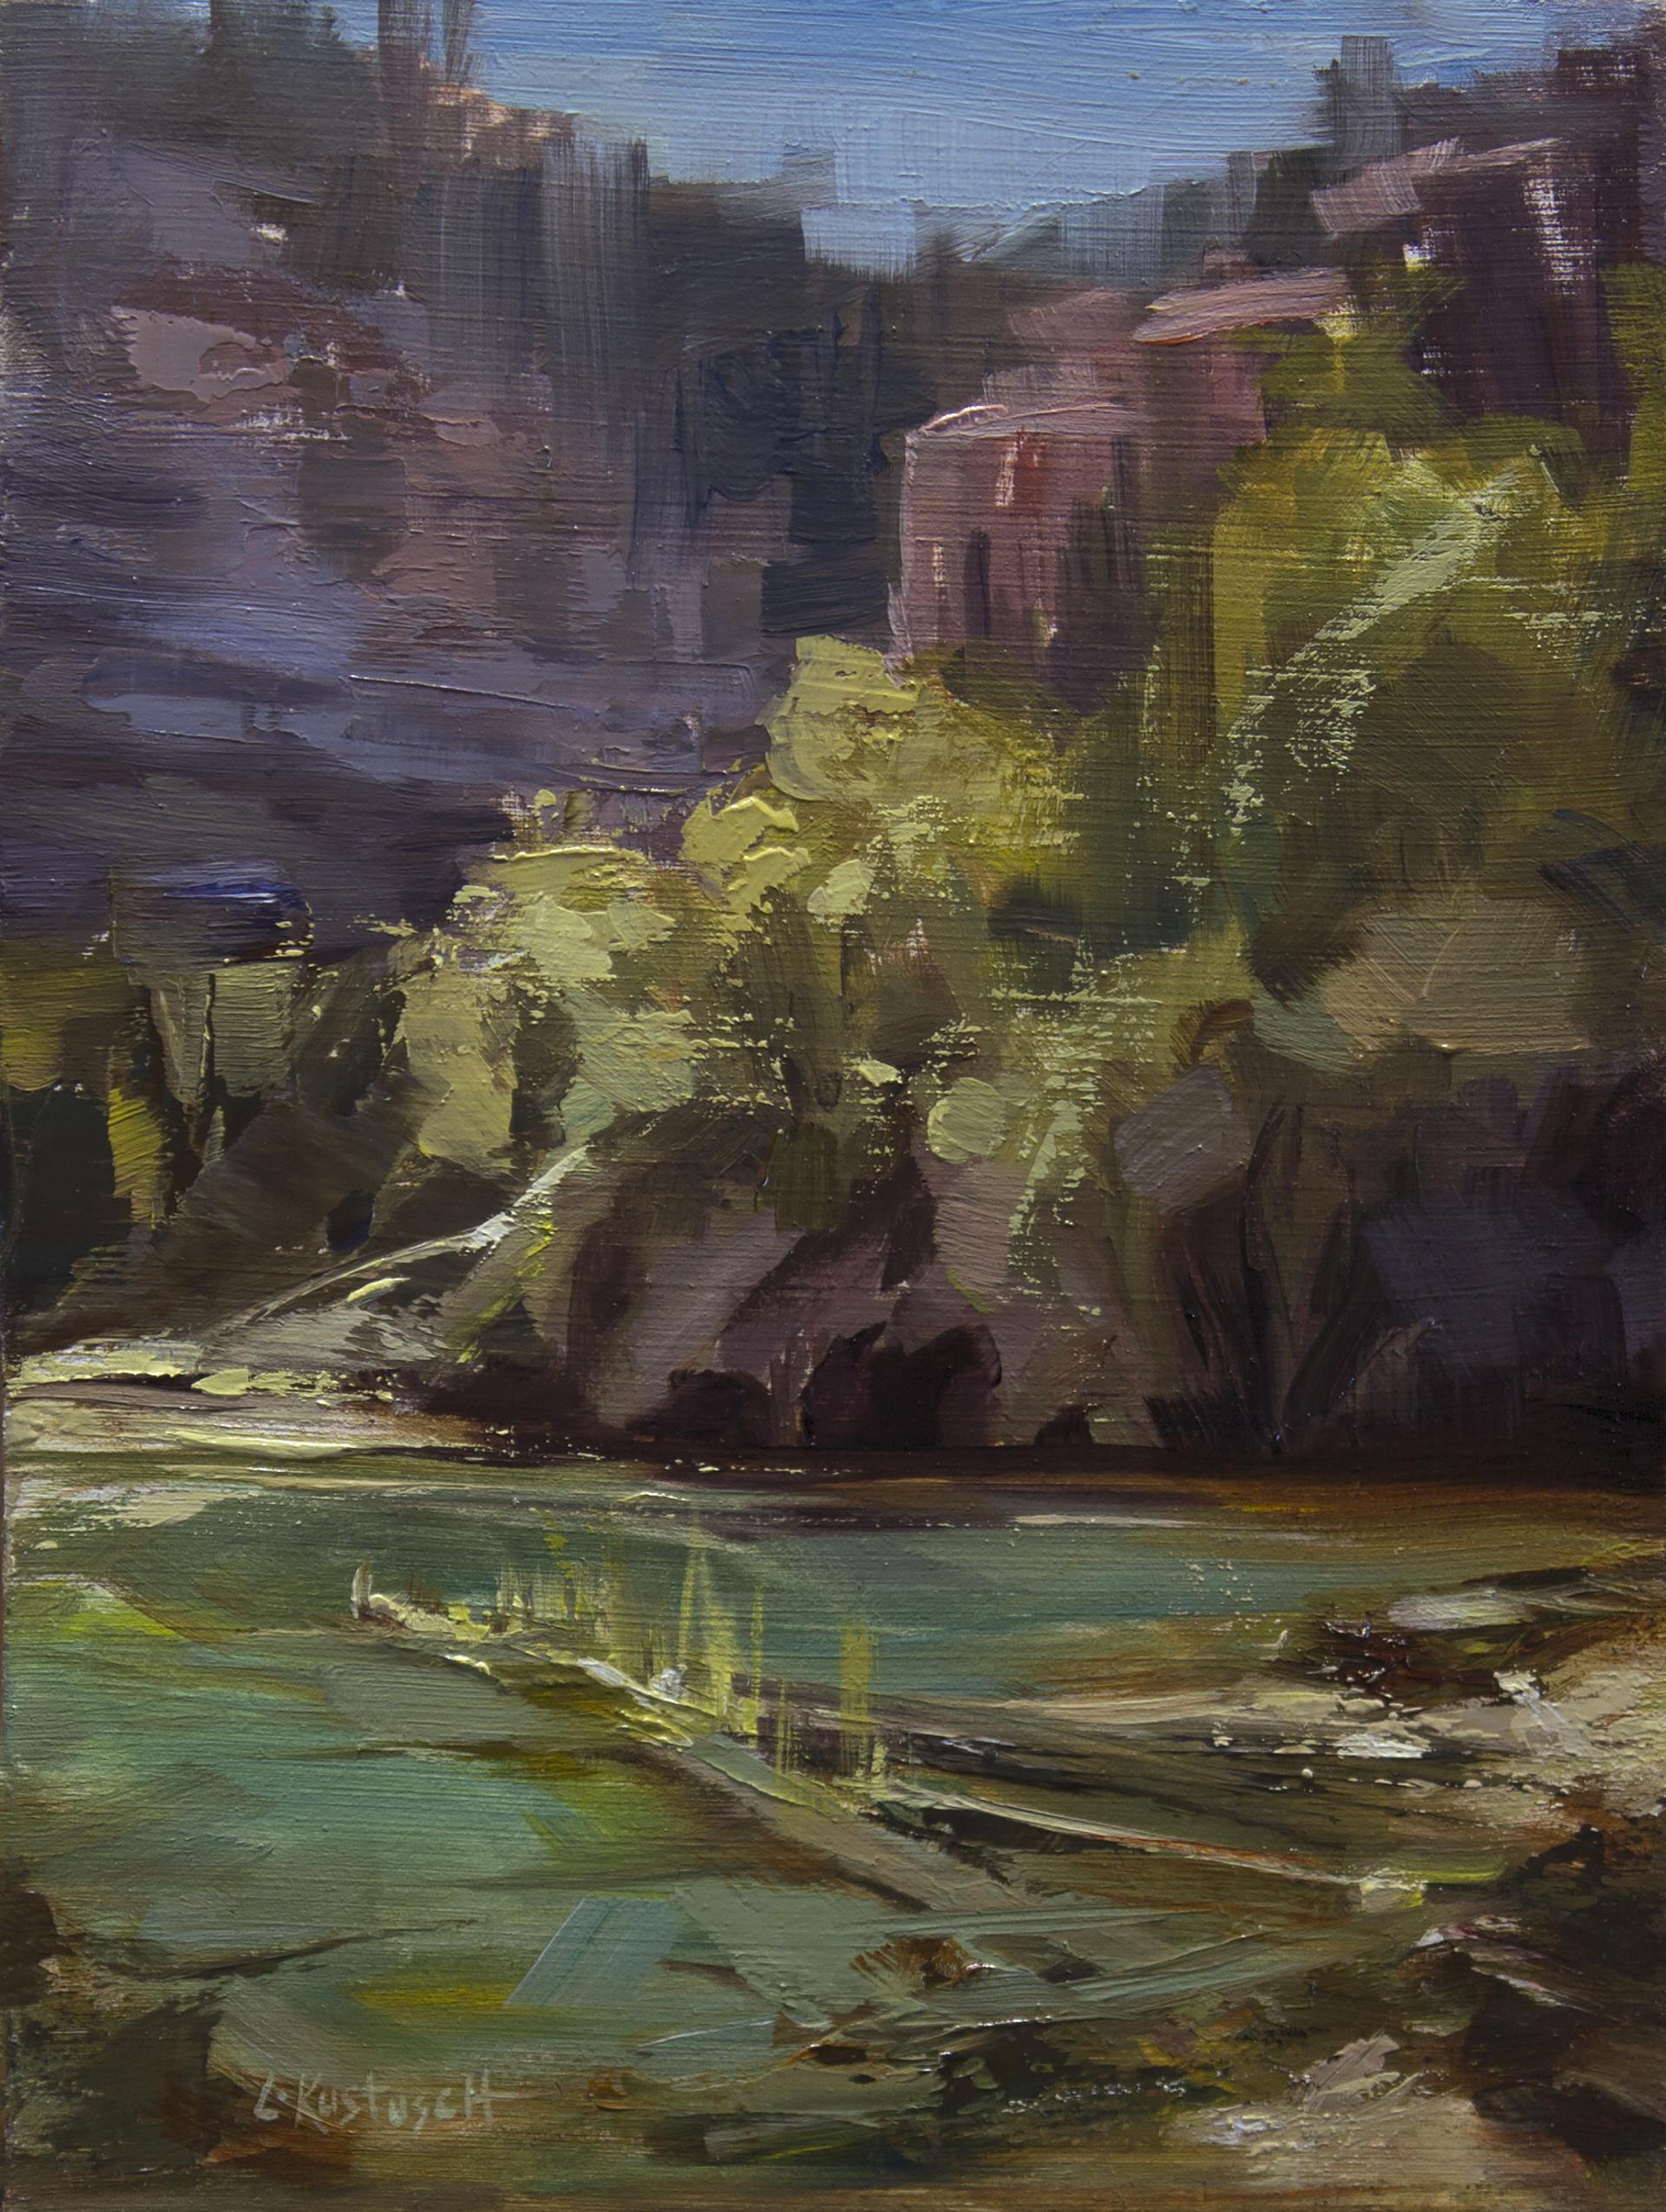 Plein Air at Emerald Lake by Lindsey Kustusch